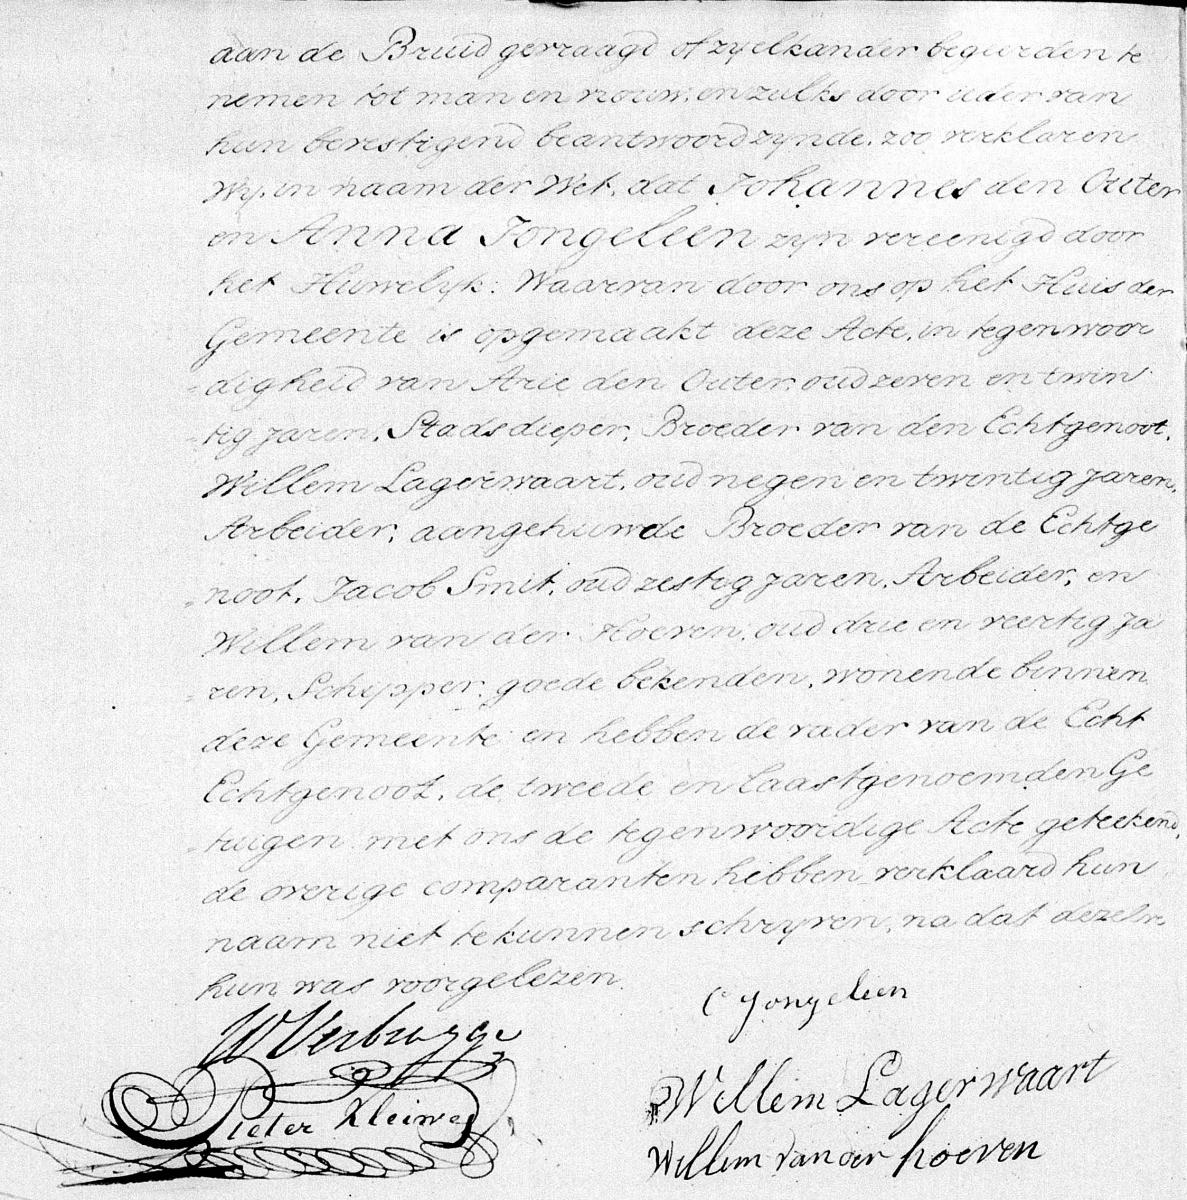 Outer-Johannes-den-en-Jongeleen-Johanna-Huw.-11-05-1825-Hillegersberg-b